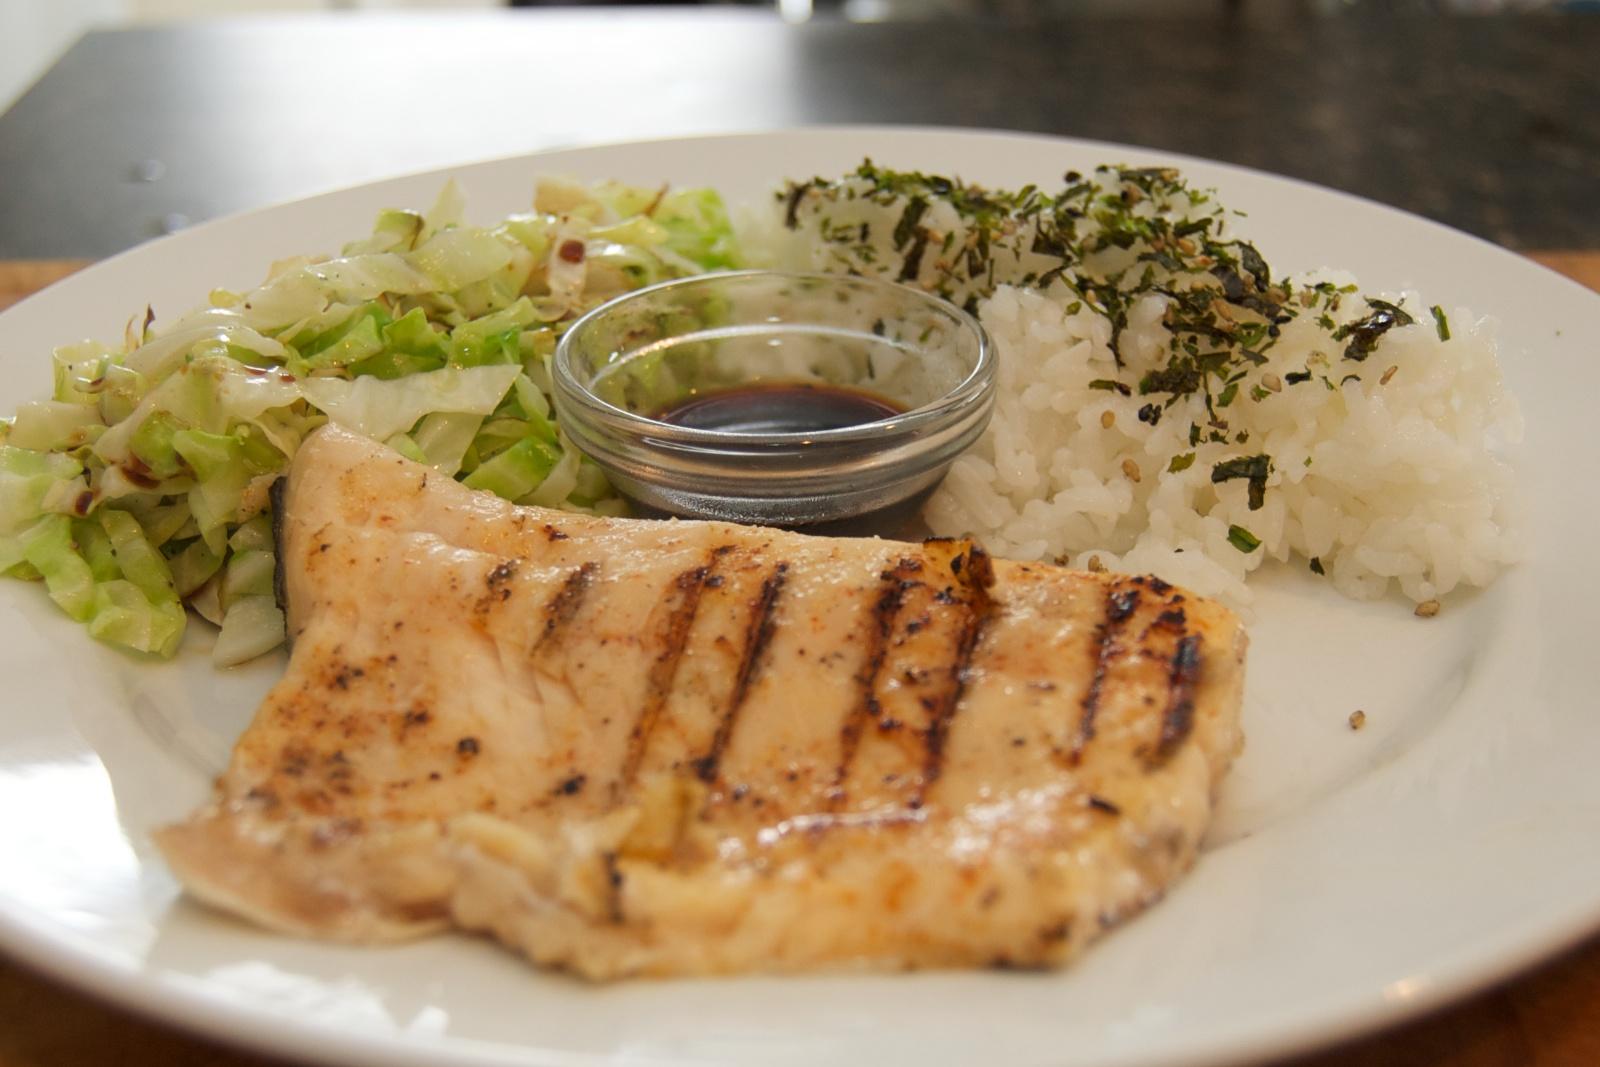 http://blog.rickk.com/food/2011/03/18/ate.2011.03.18.d.jpg